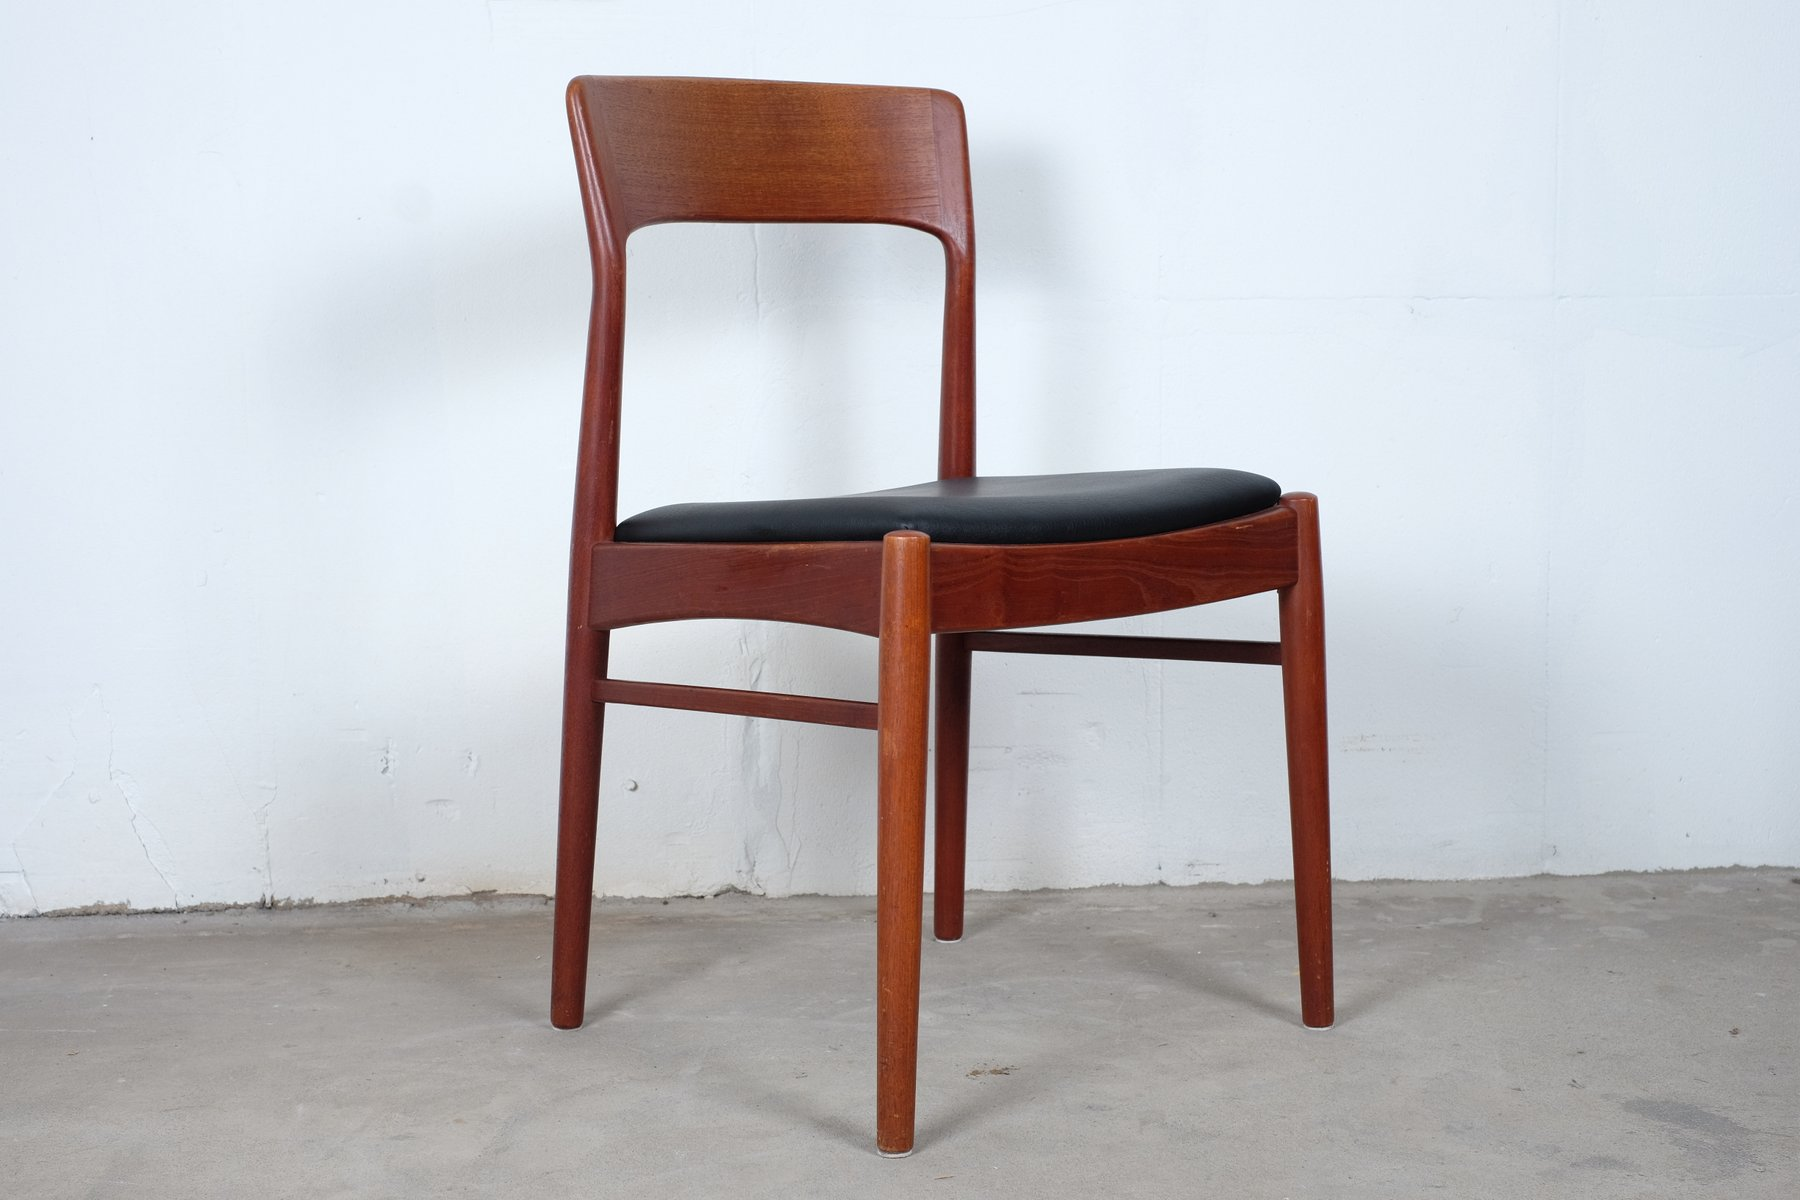 Mid century rosewood dining chairs by kai kristiansen for korup stolefabrik set of 6 for sale - Kai kristiansen chairs ...